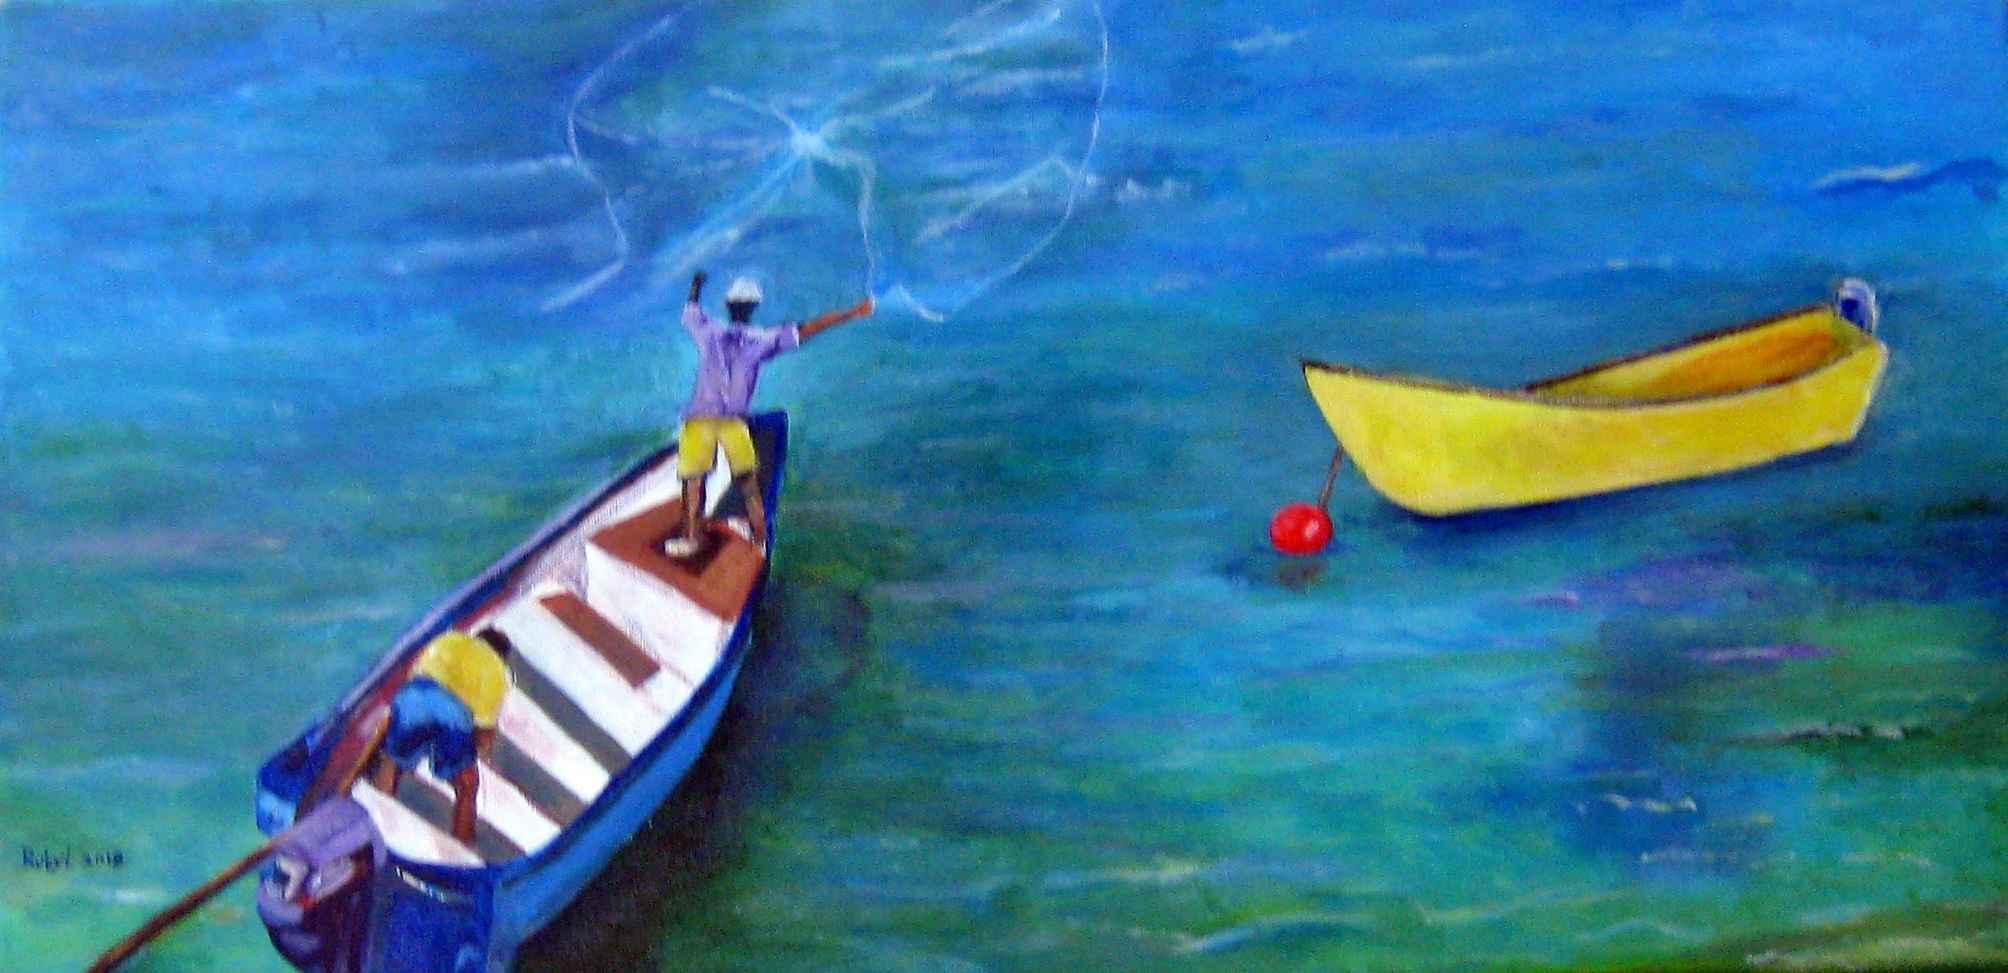 The Fisherman by  Ruby Lloyd - Masterpiece Online